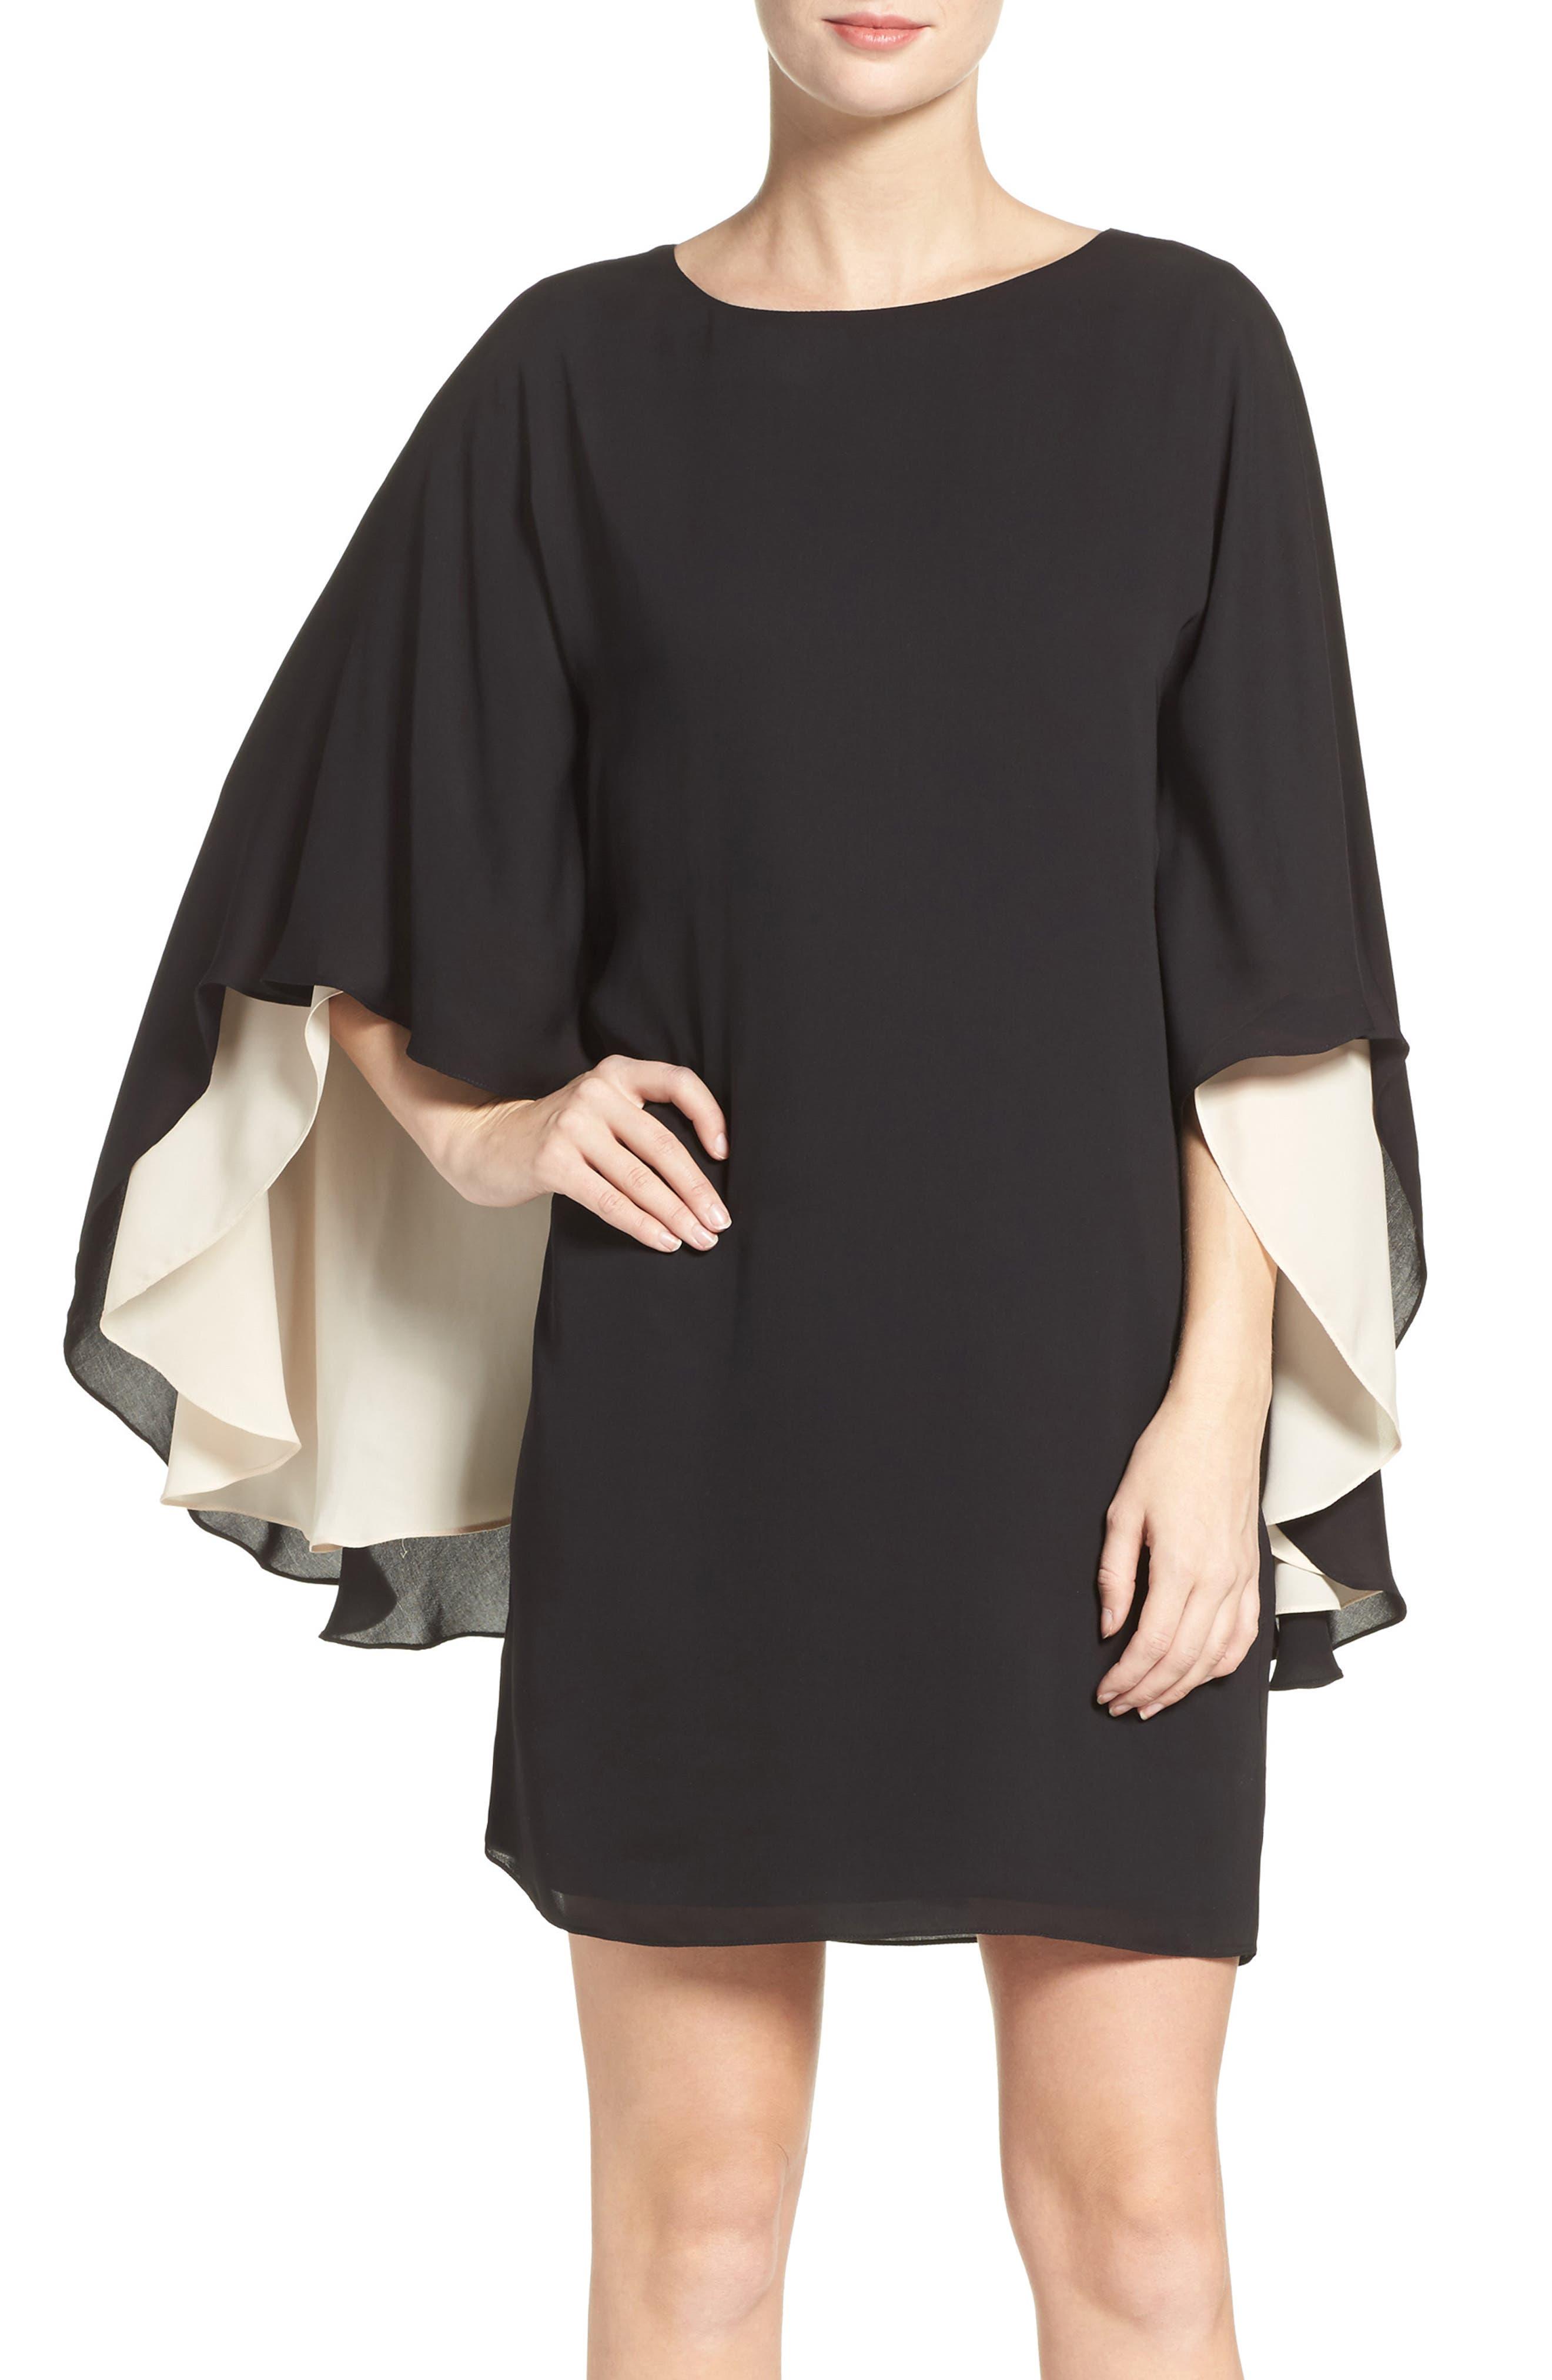 Alternate Image 1 Selected - Halston Heritage Cape Sleeve Shift Dress